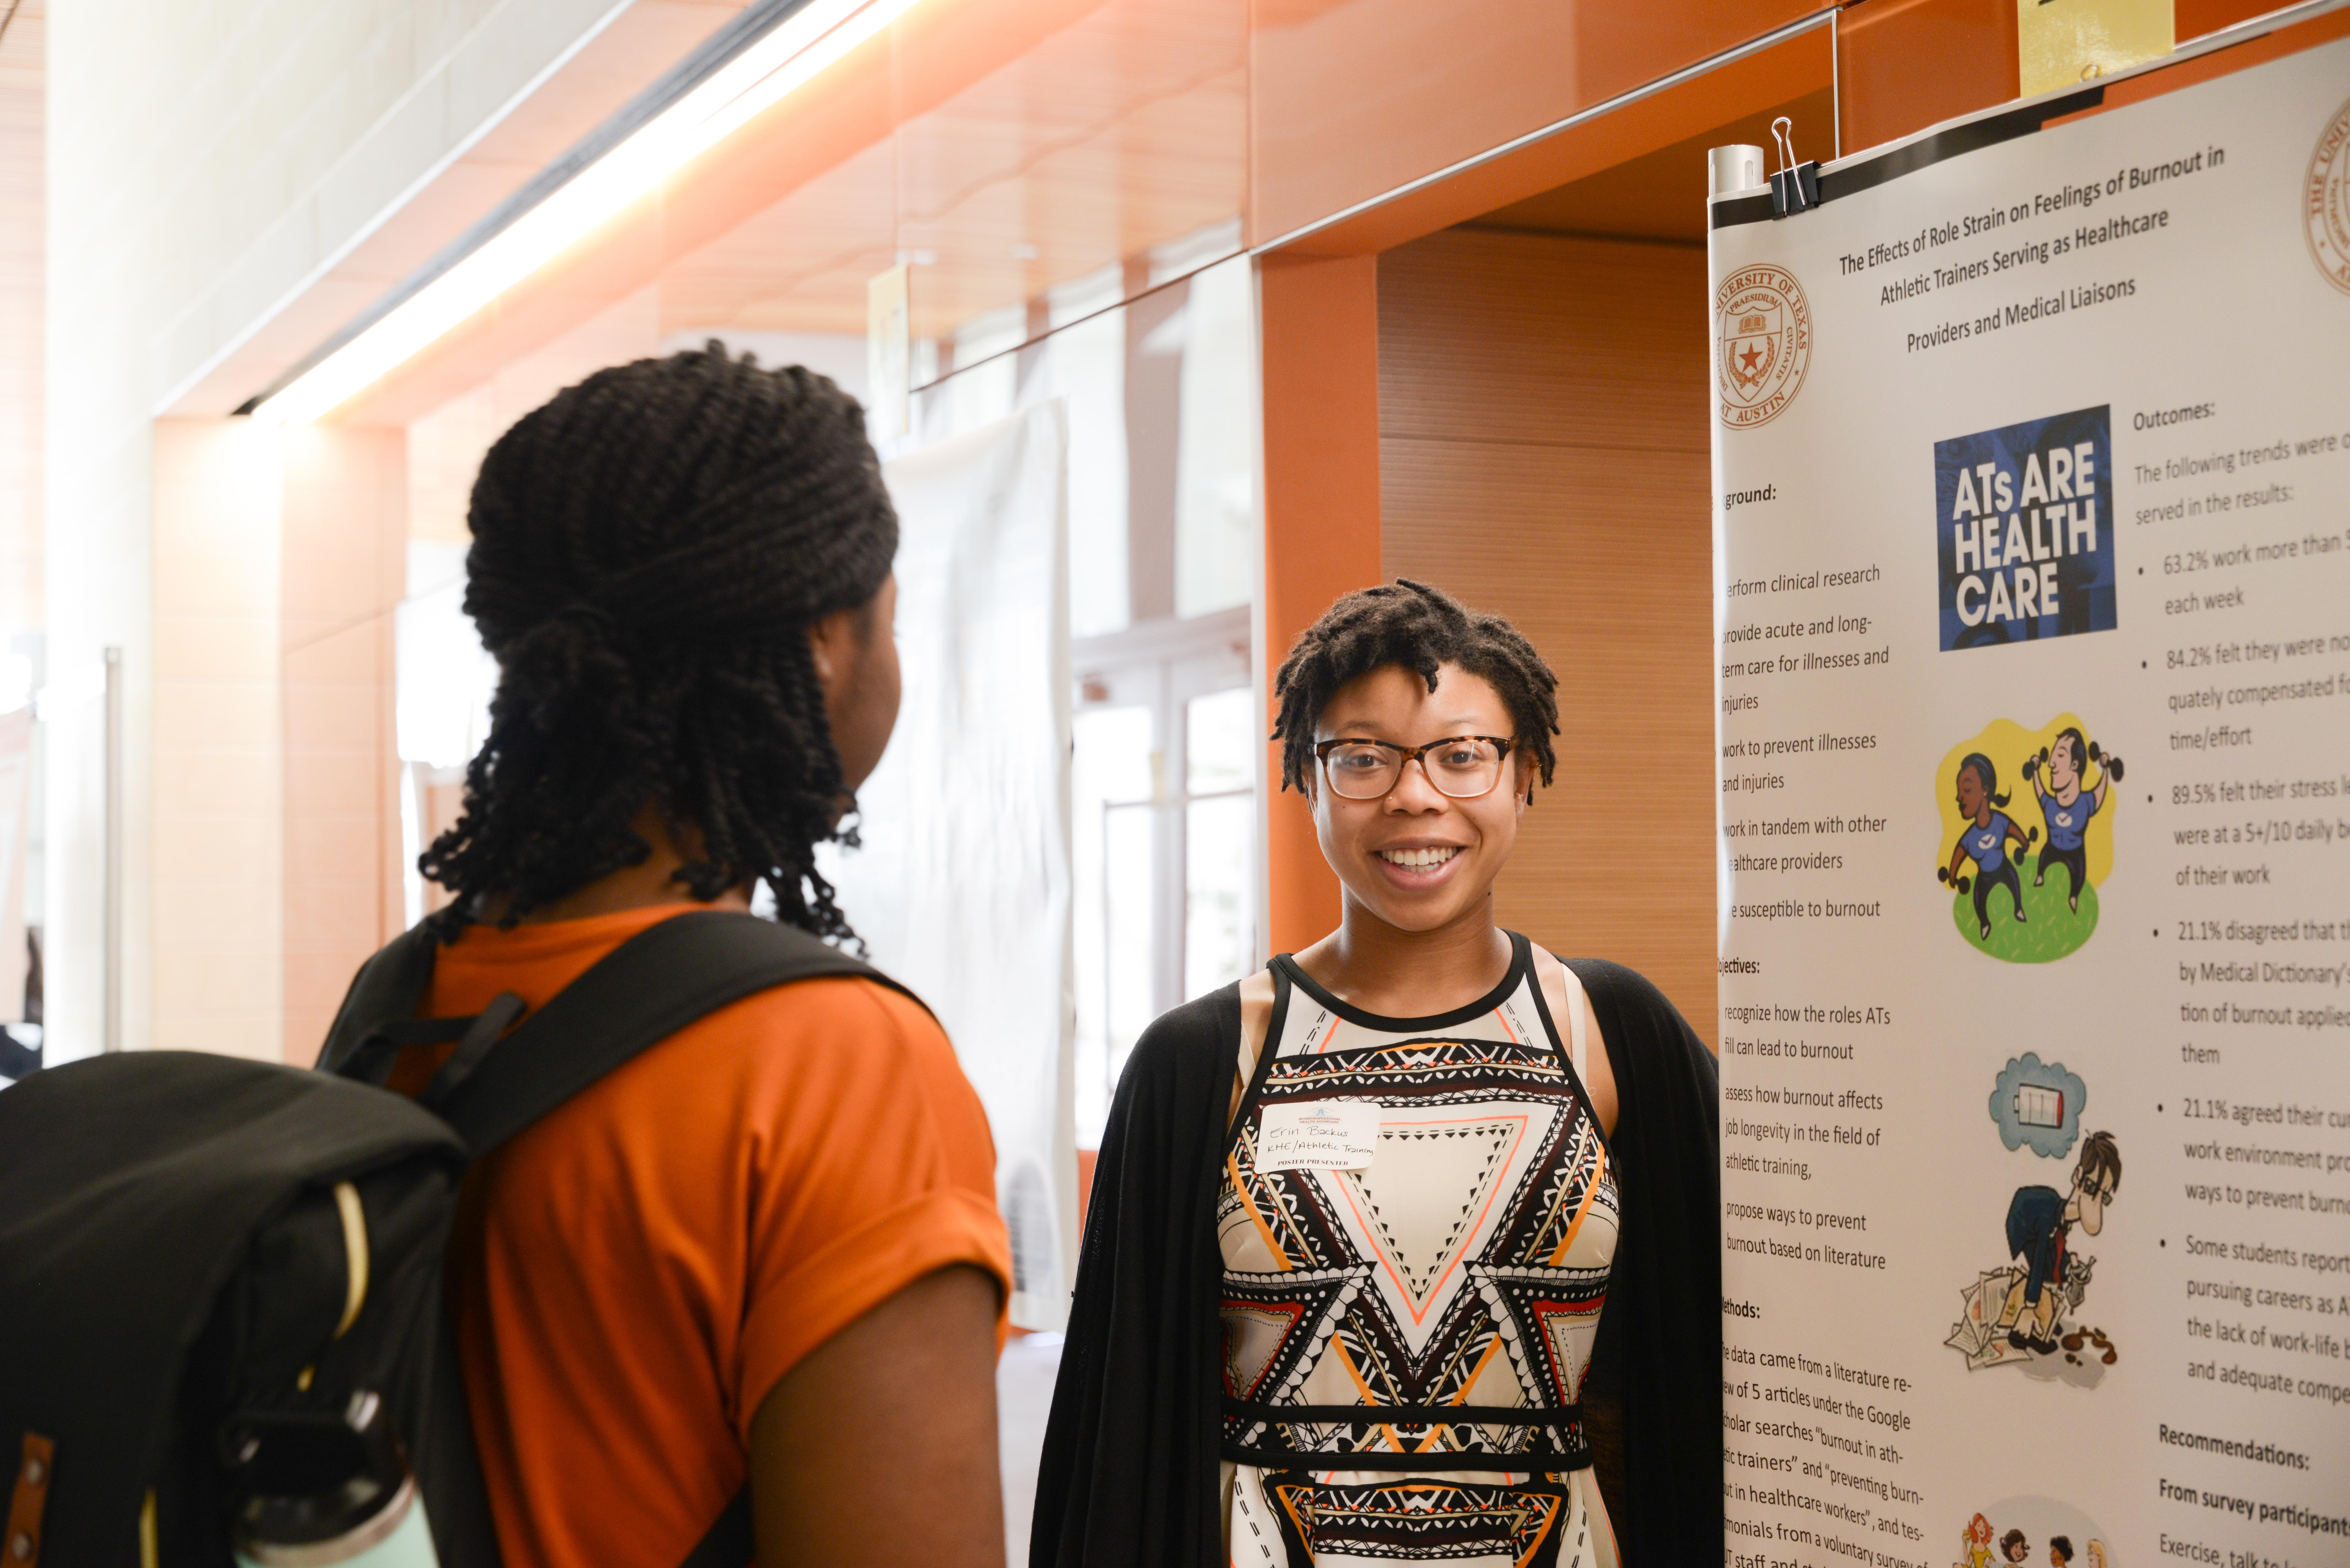 Student at poster presentation